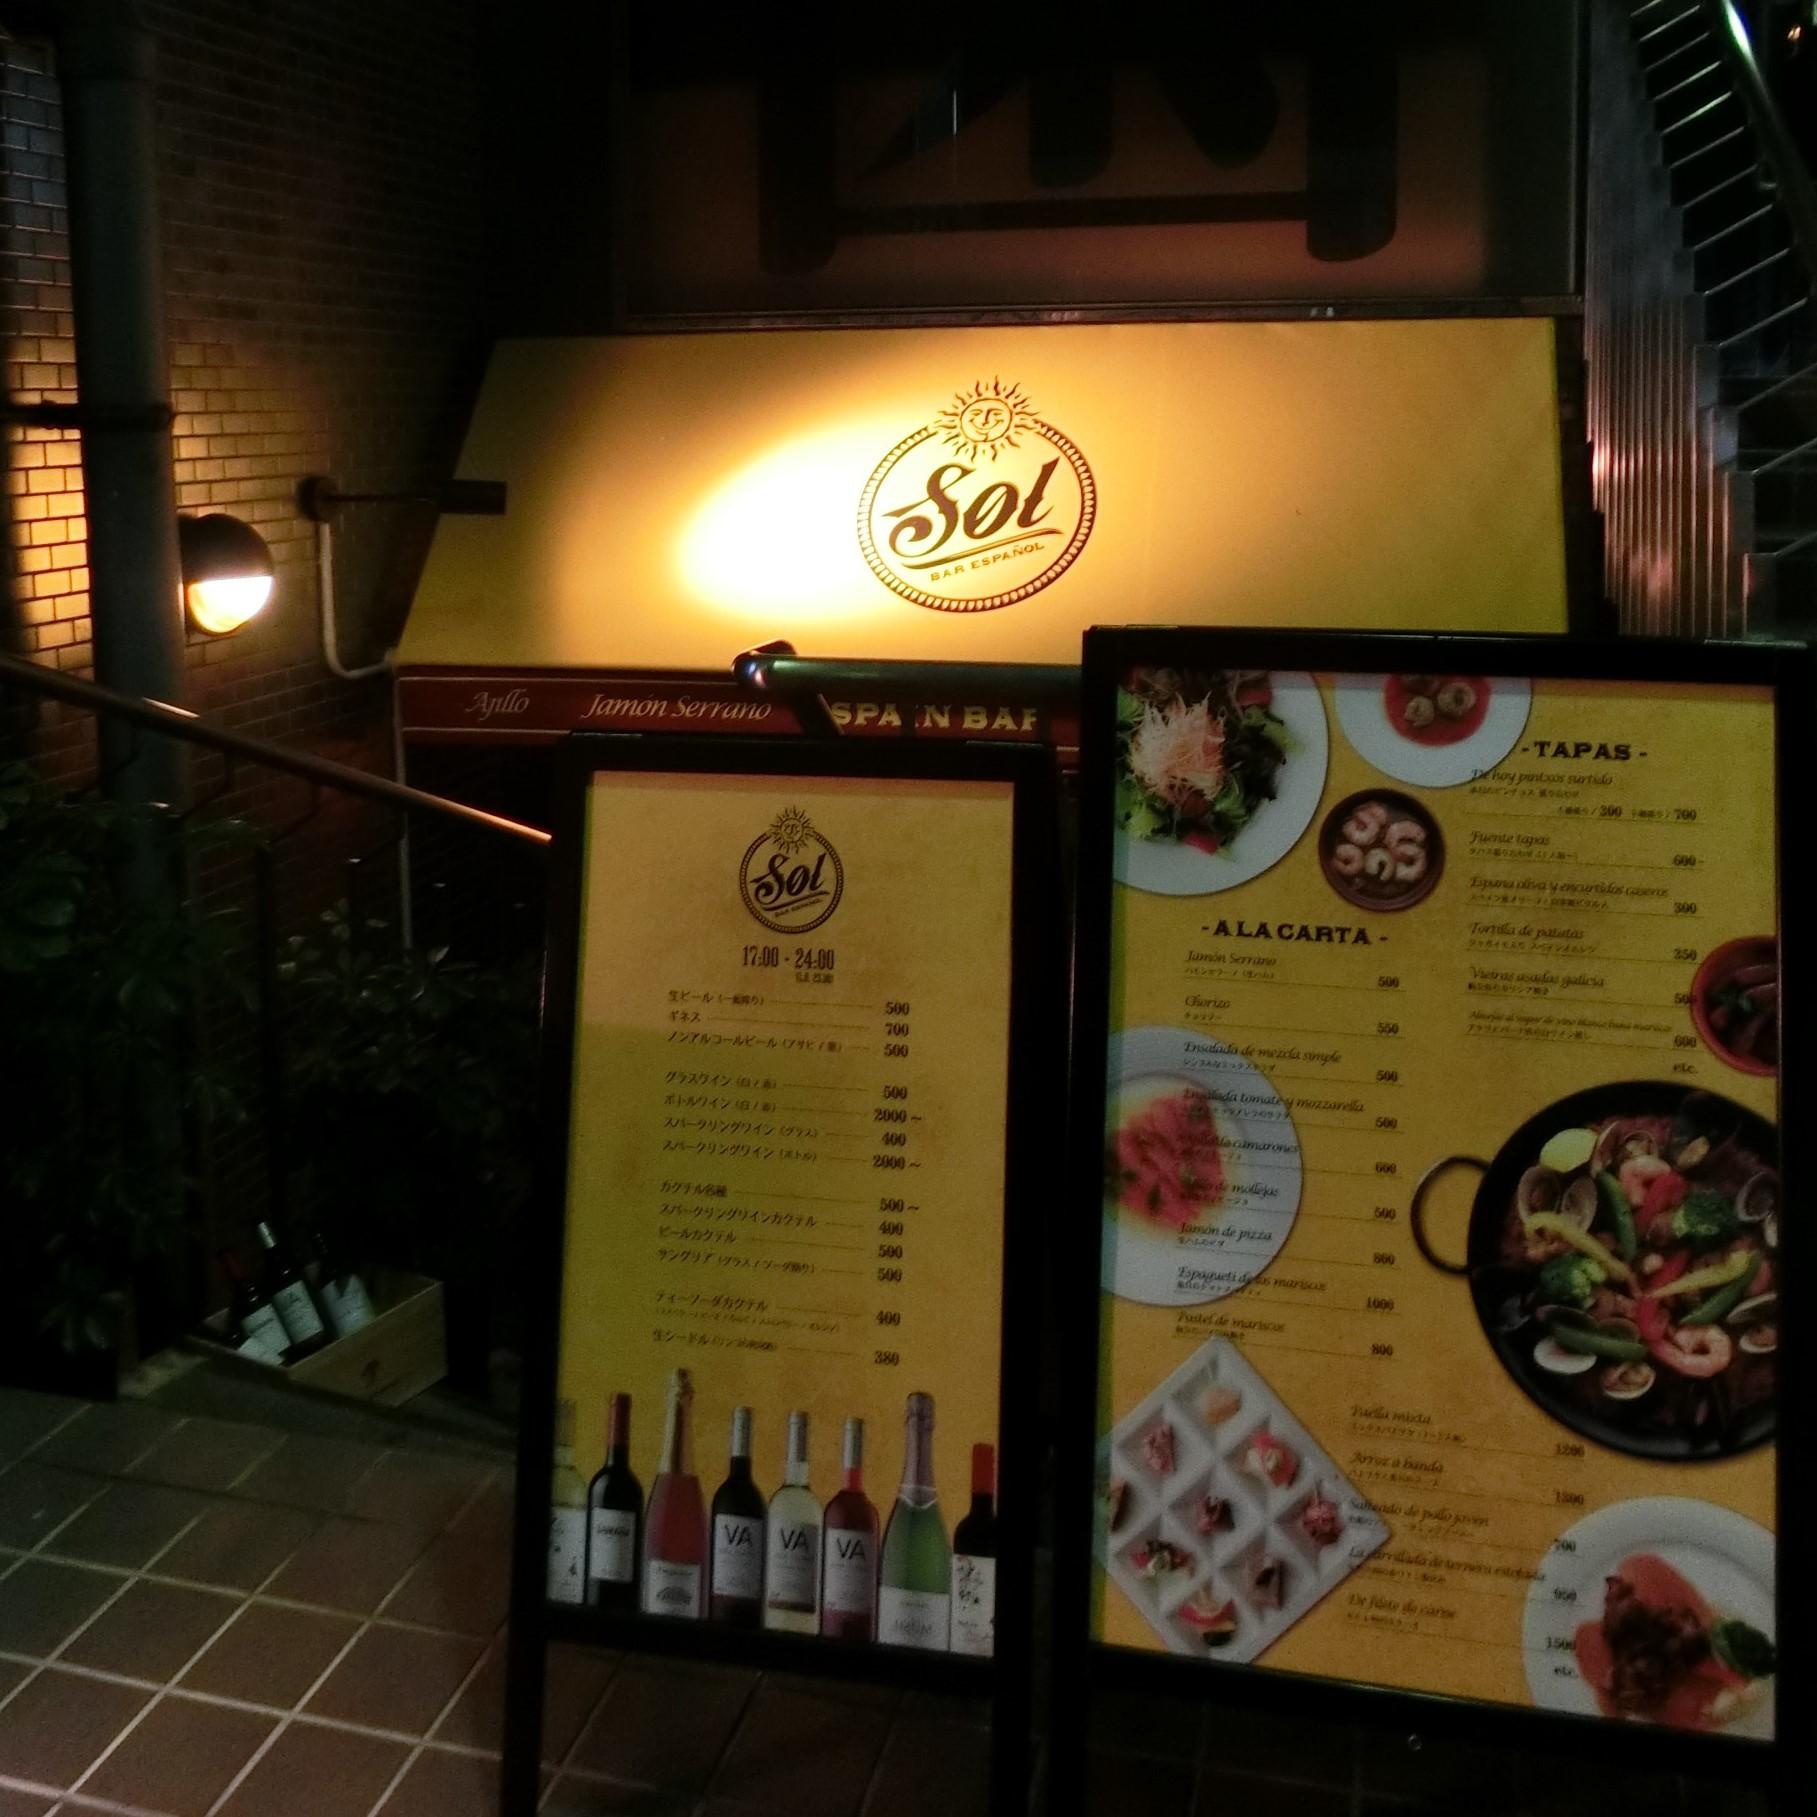 Spain Bar Sol